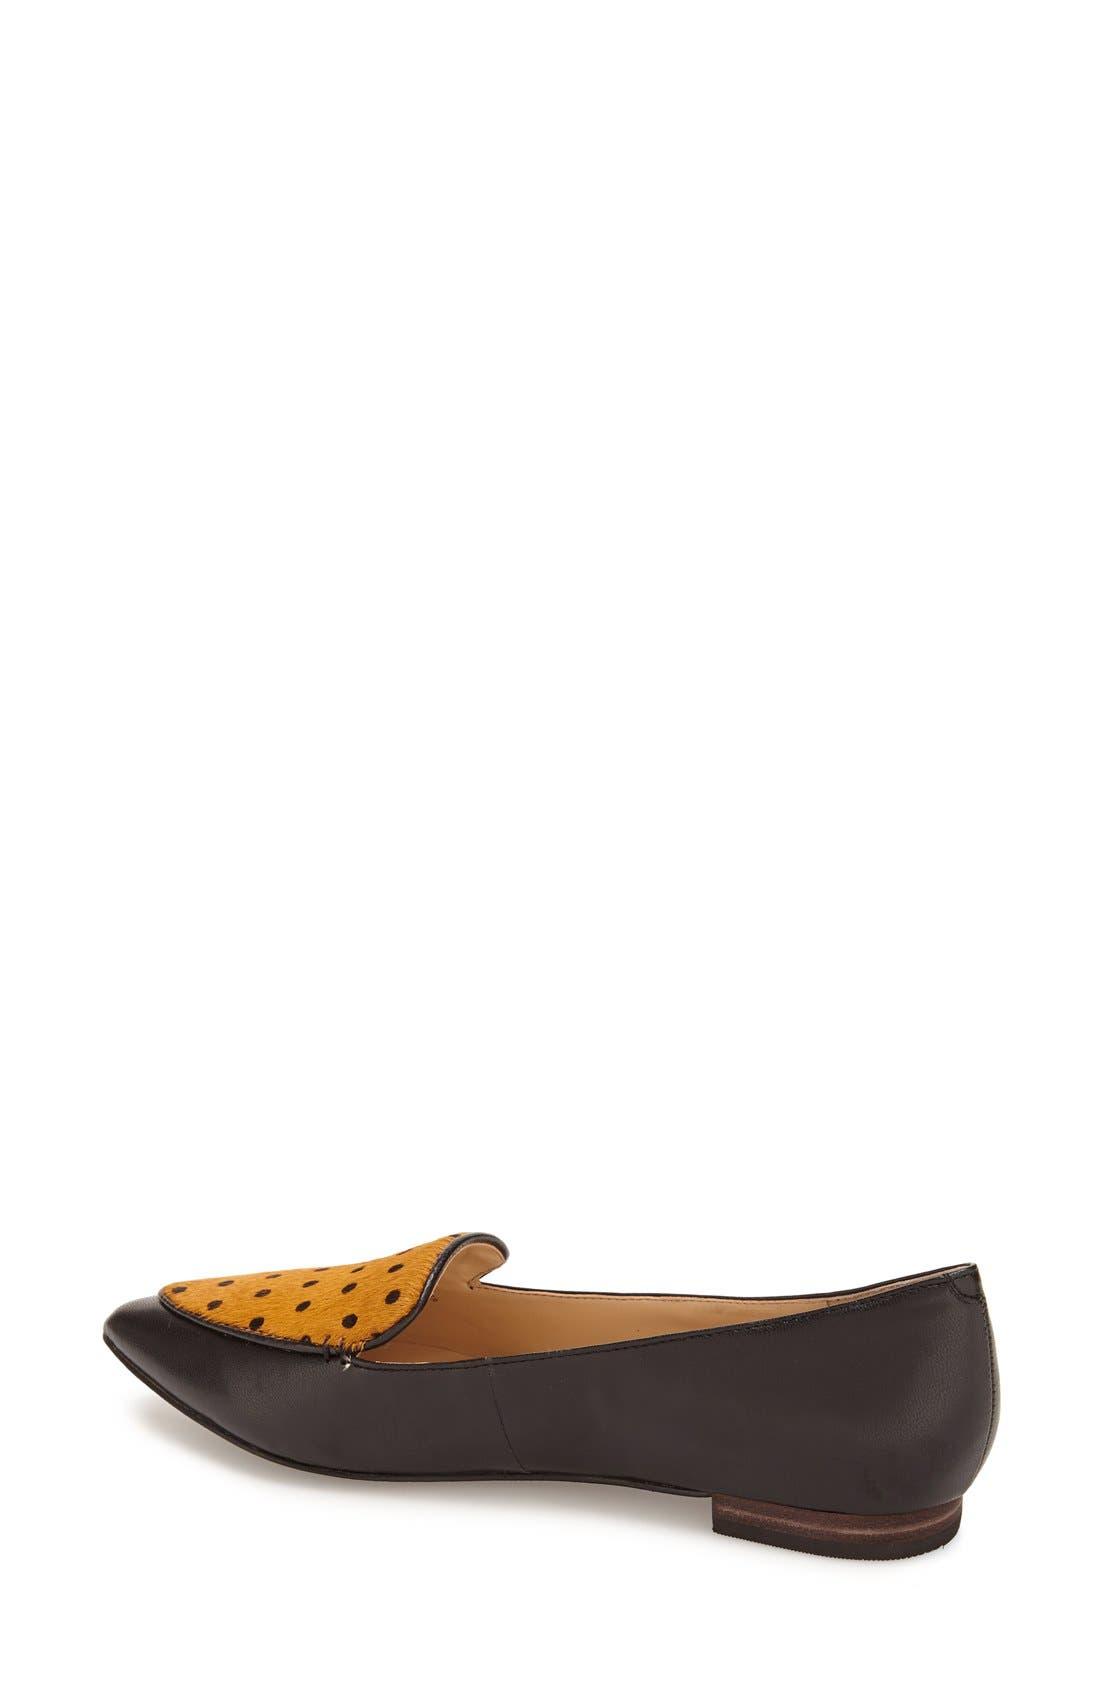 Alternate Image 2  - Sole Society 'Cammila' Pointy Toe Loafer (Women)